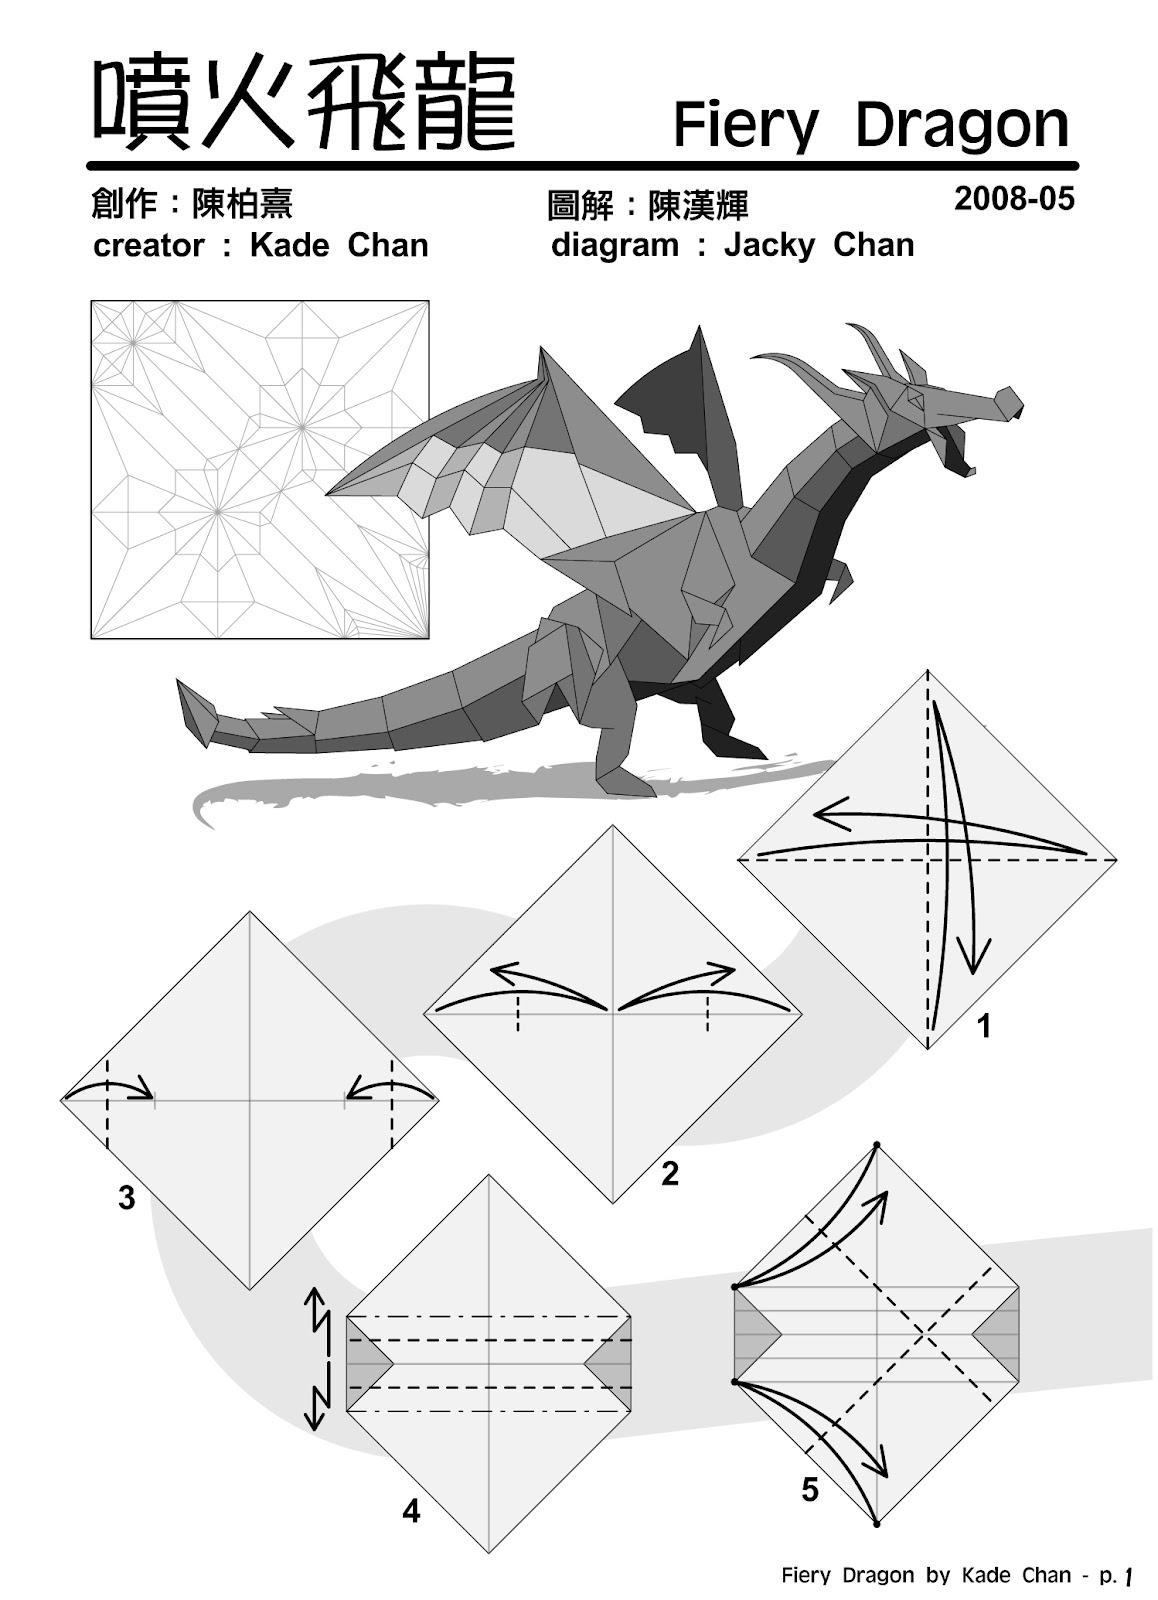 Kade Chan Origami Blog 香港摺紙工作室 (日誌): Fiery Dragon